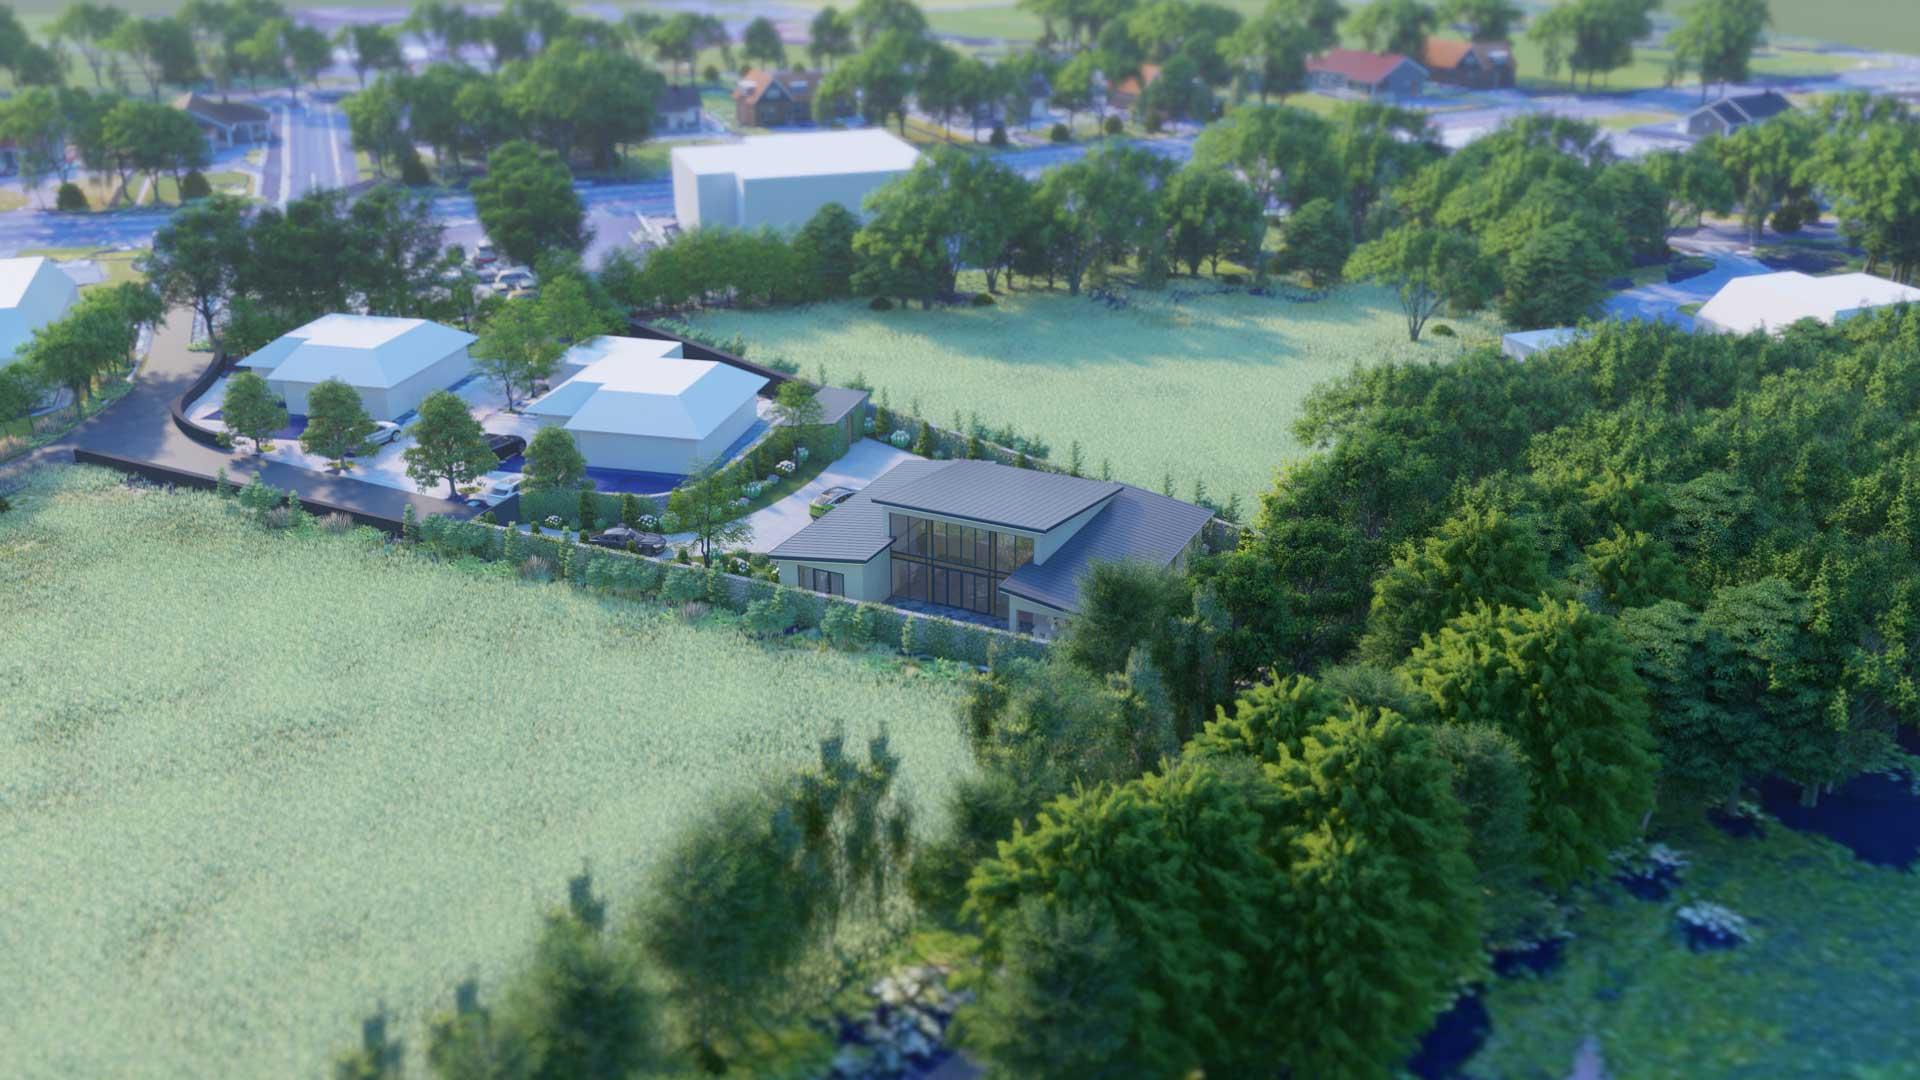 EcoHouse Kilkenny ProjectjkV1T2_7---Photo